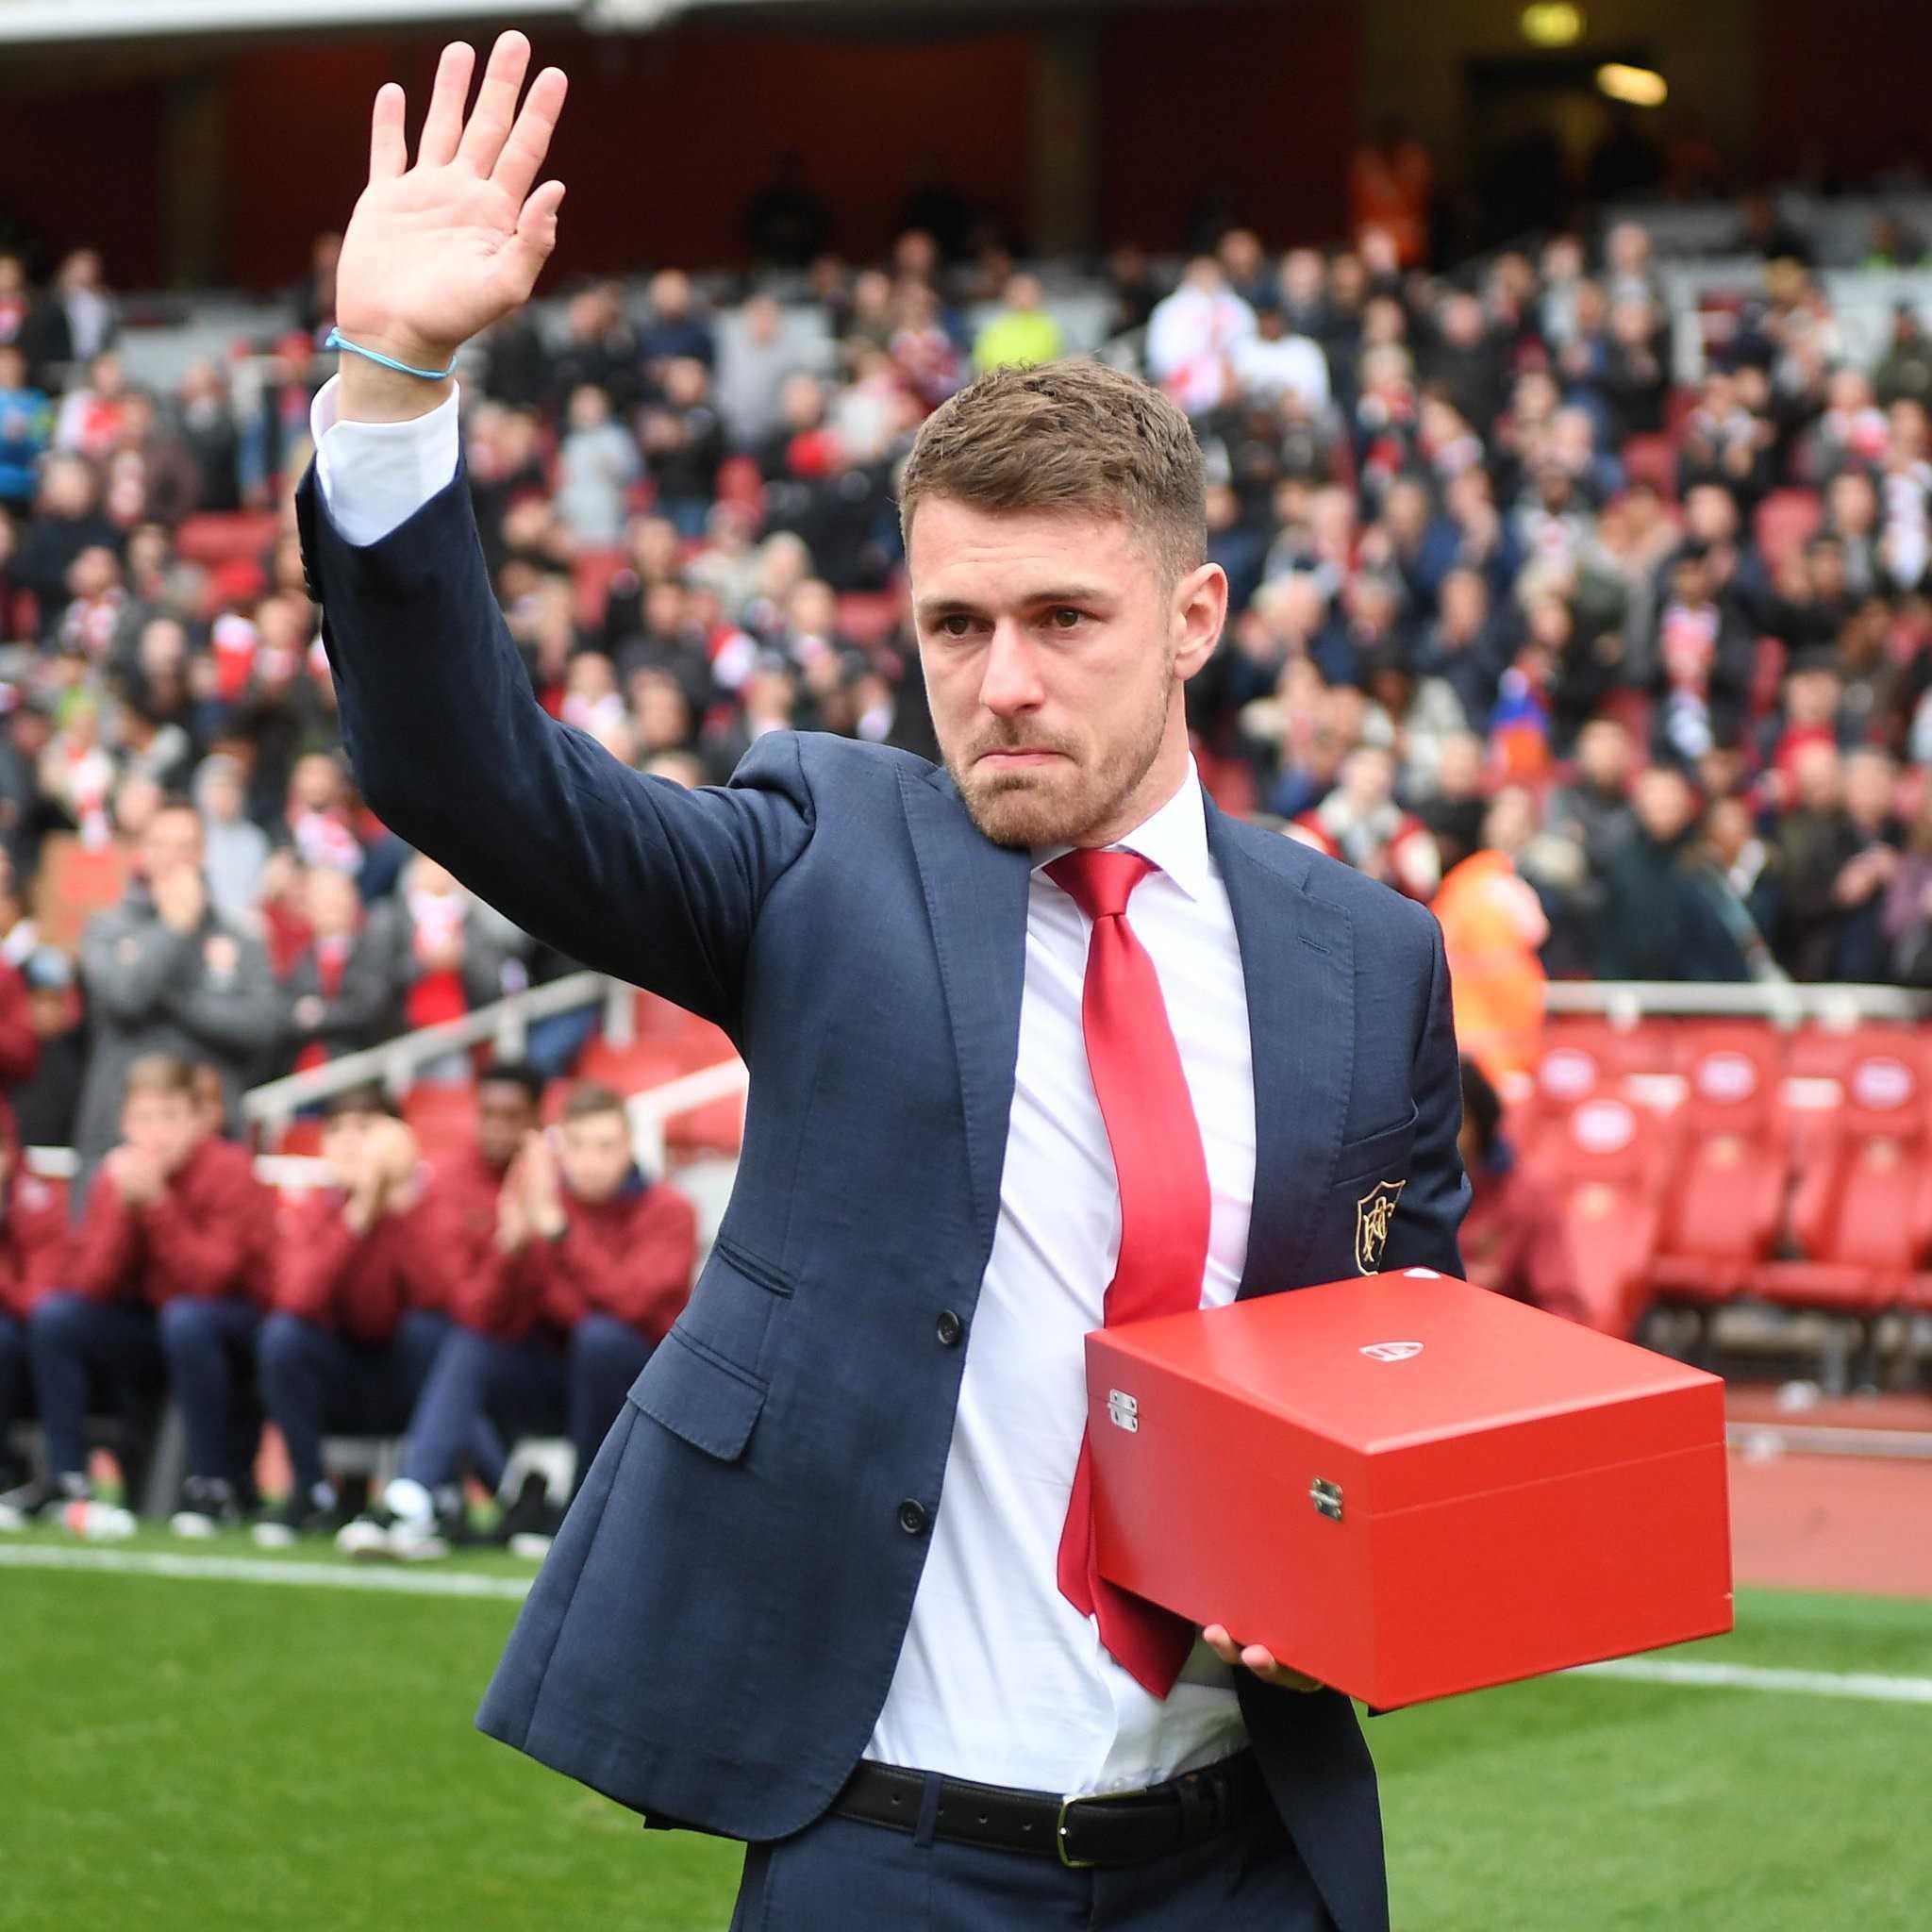 Arsenal, Ramsey saluta in lacrime l'Emirates ei propri tifosi